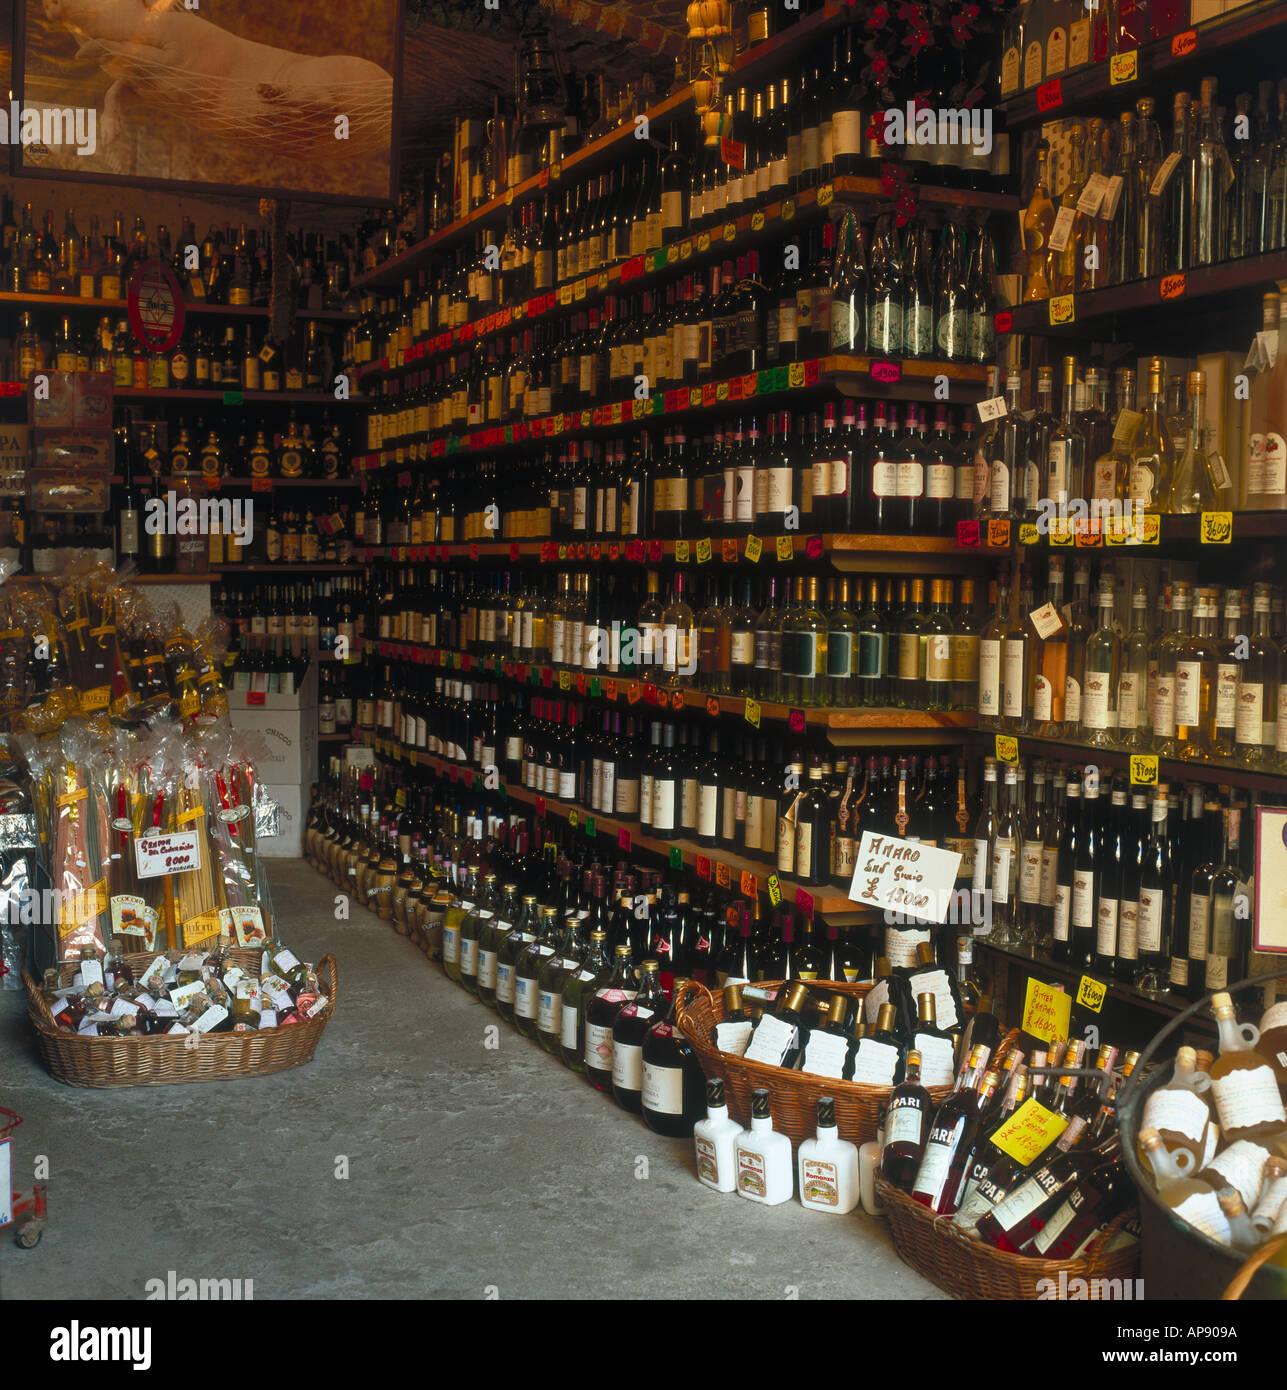 Wine bottles inside shop, Piedmont, Italy Stock Photo